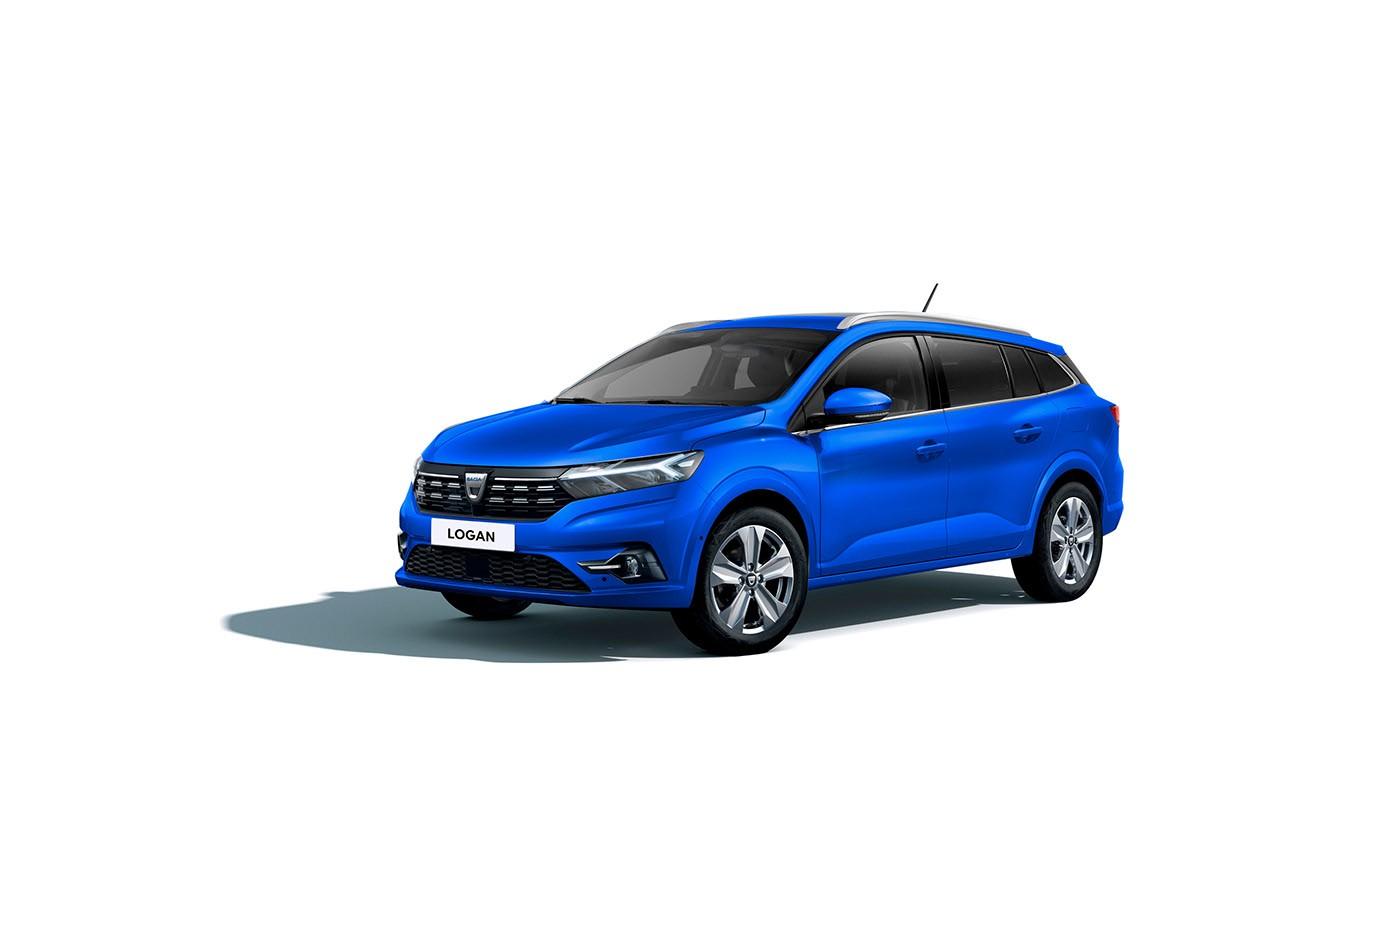 Dacia_Sandero_Renderings_0004